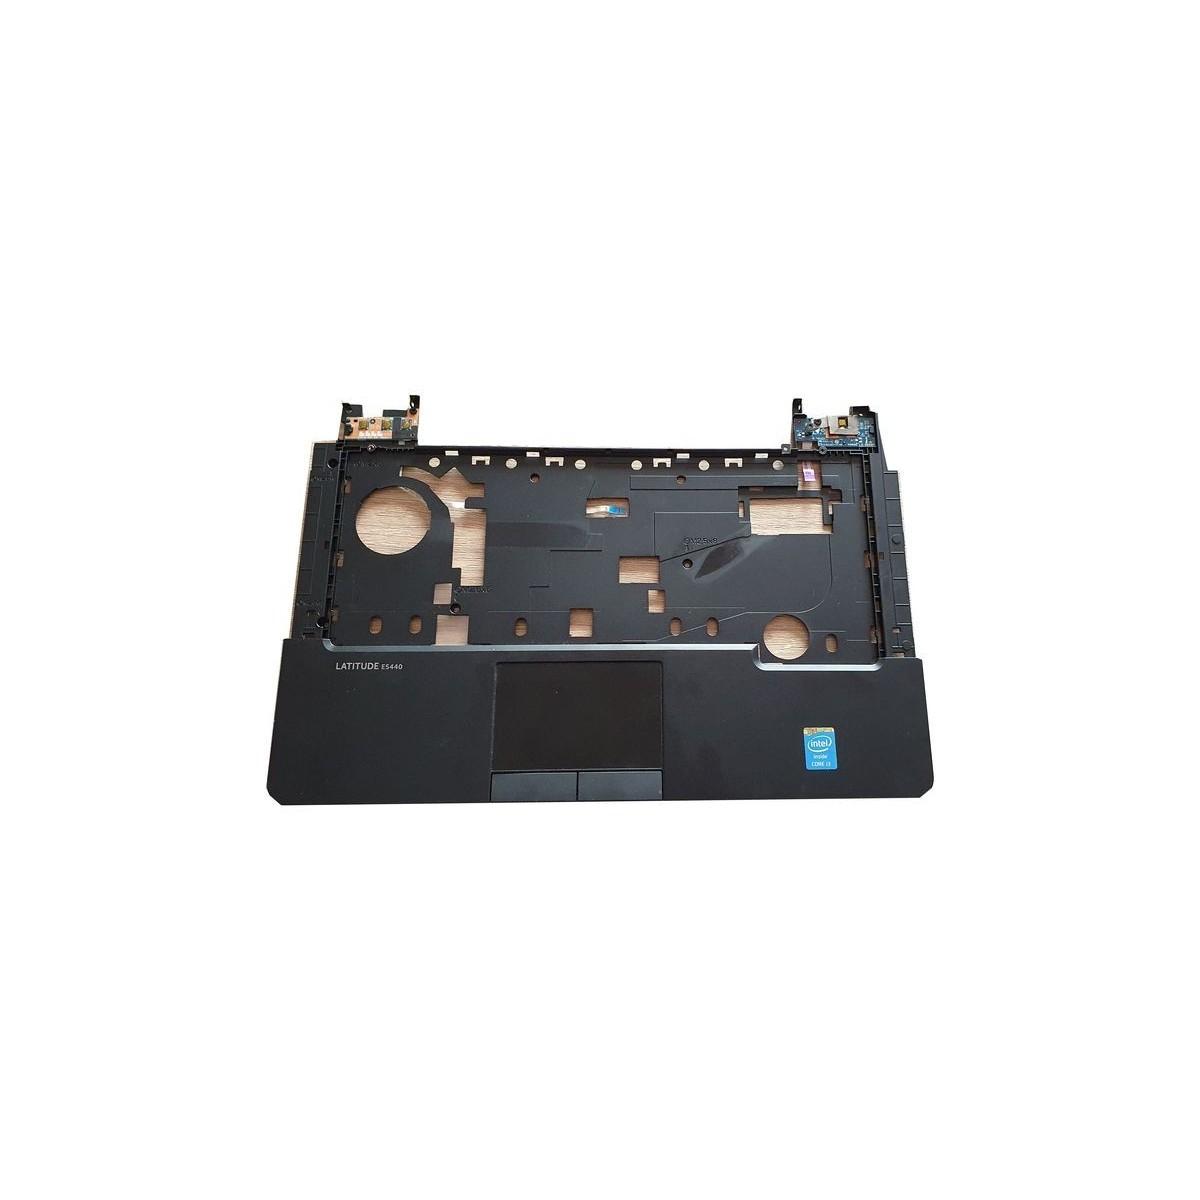 DELL 7020 MT 3.60 i3 4160 8GB 250GB SSD WIN10 PRO